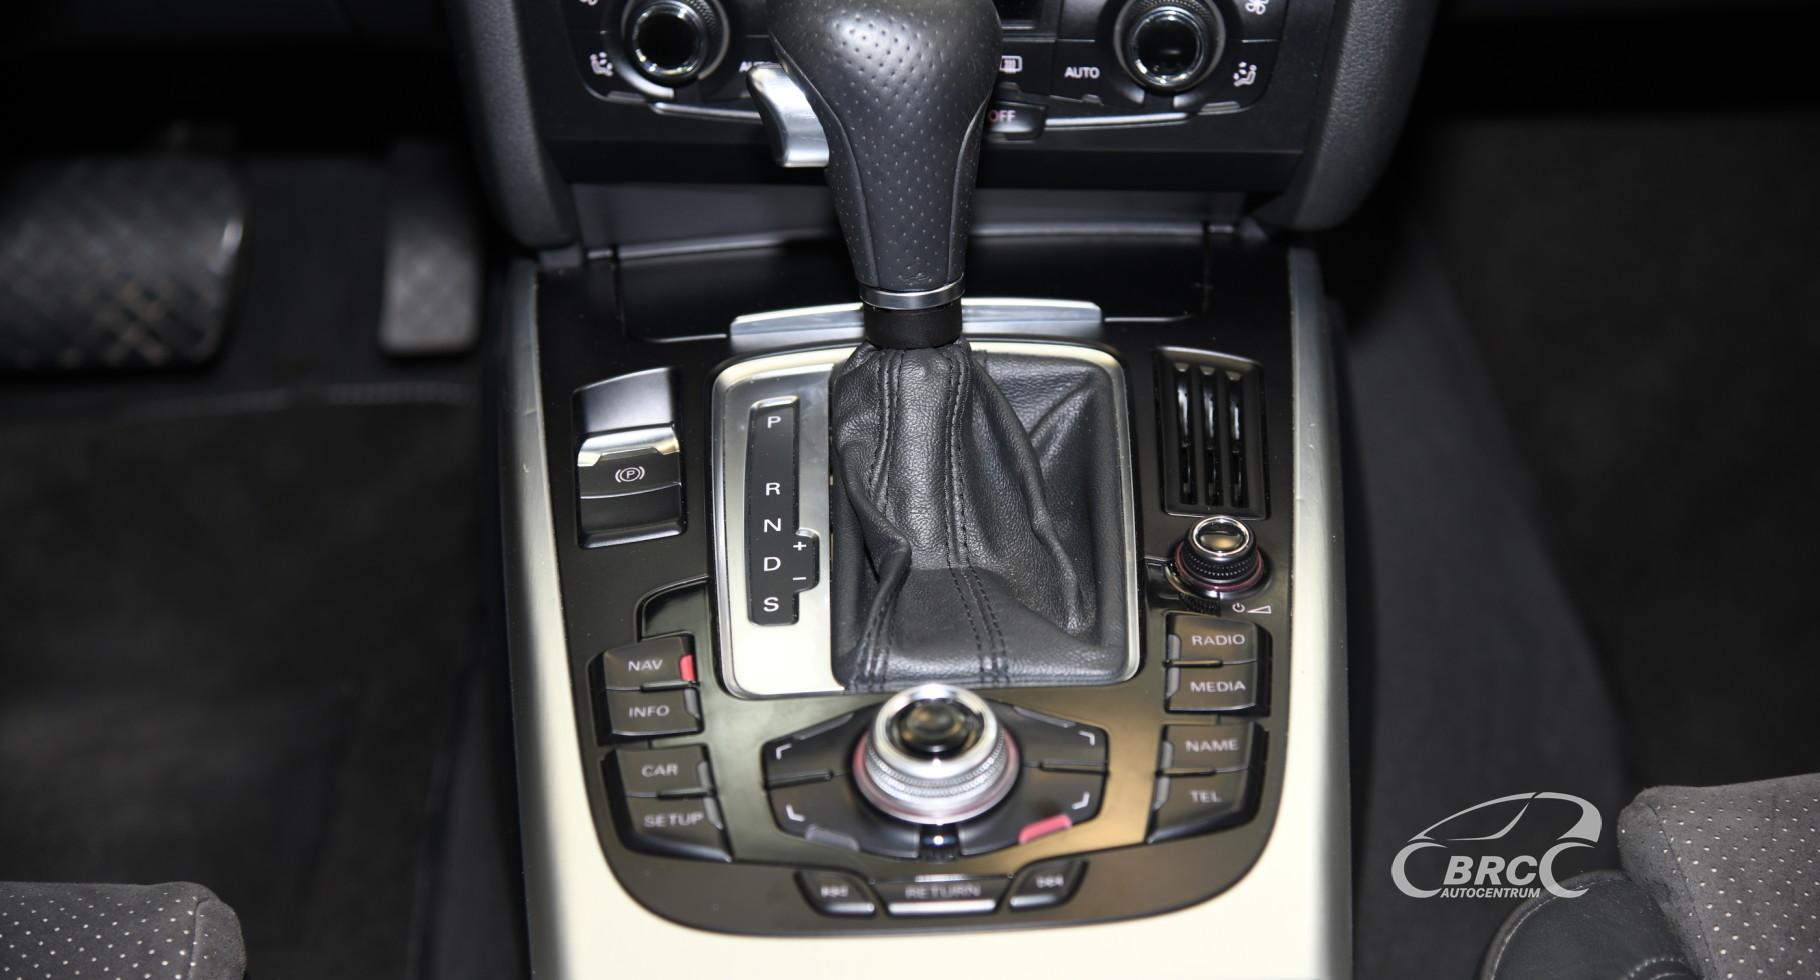 Audi A4 2.7 TDI S-Line Automatas